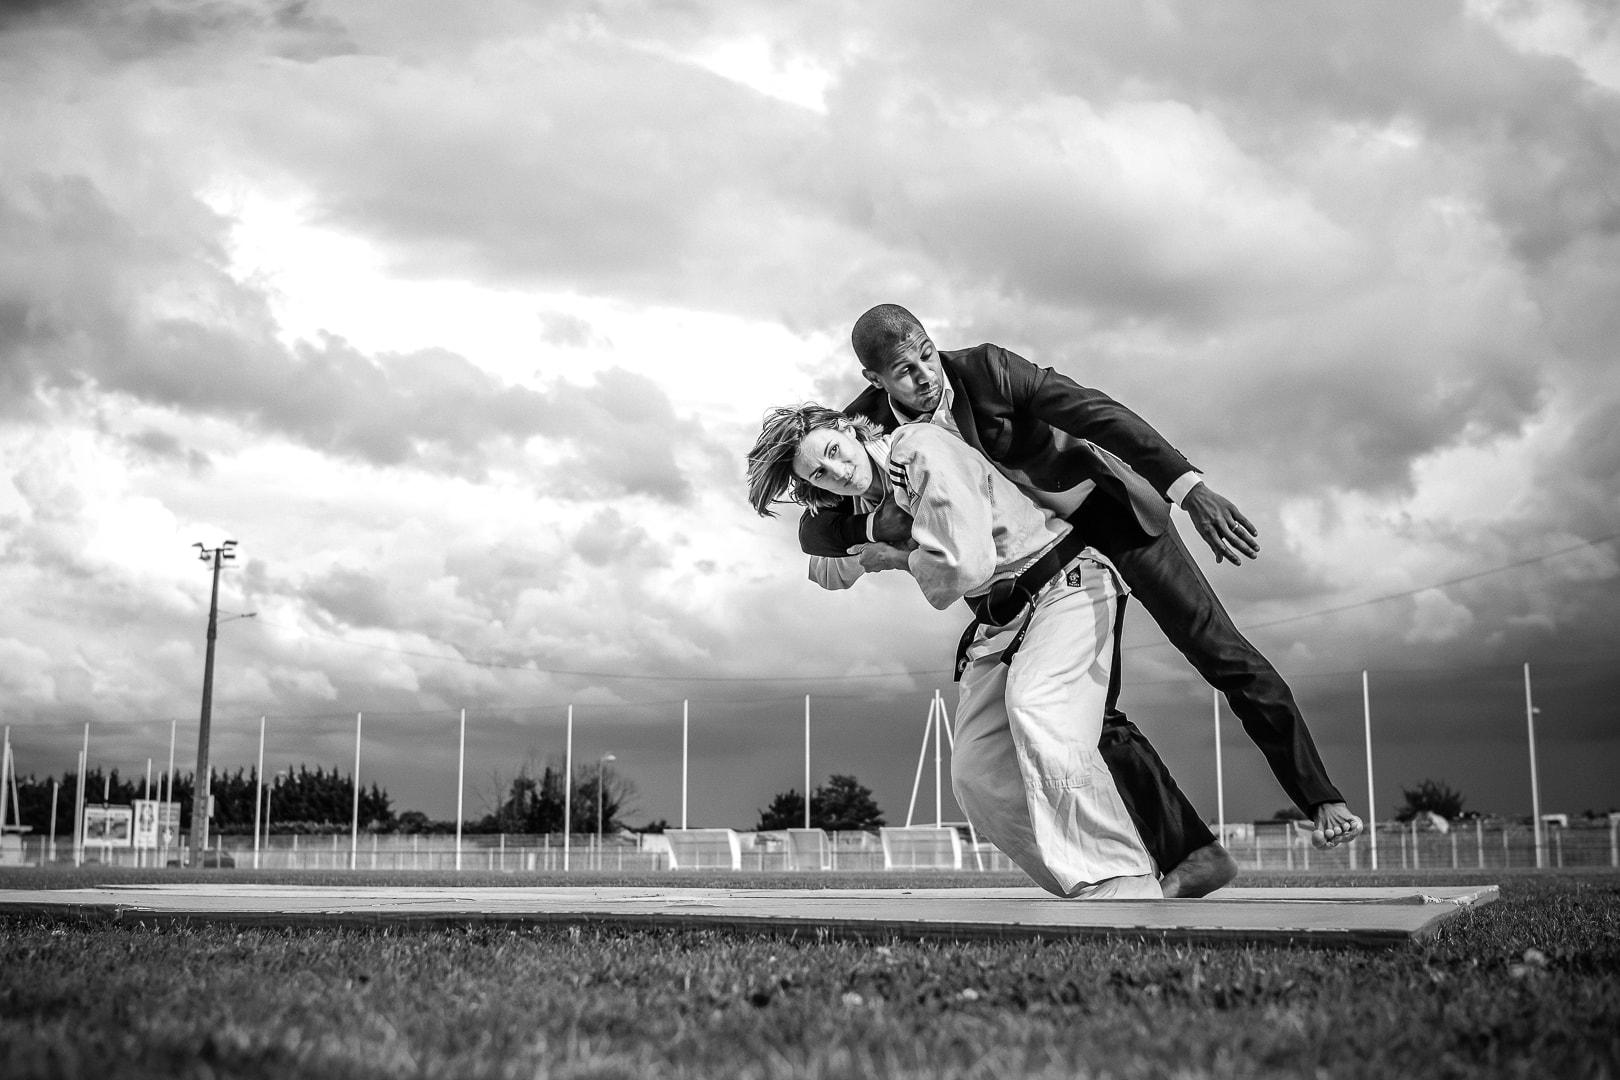 trezors-photography-photographe-professionnel-toulouse-31-sport-lifestyle-judo